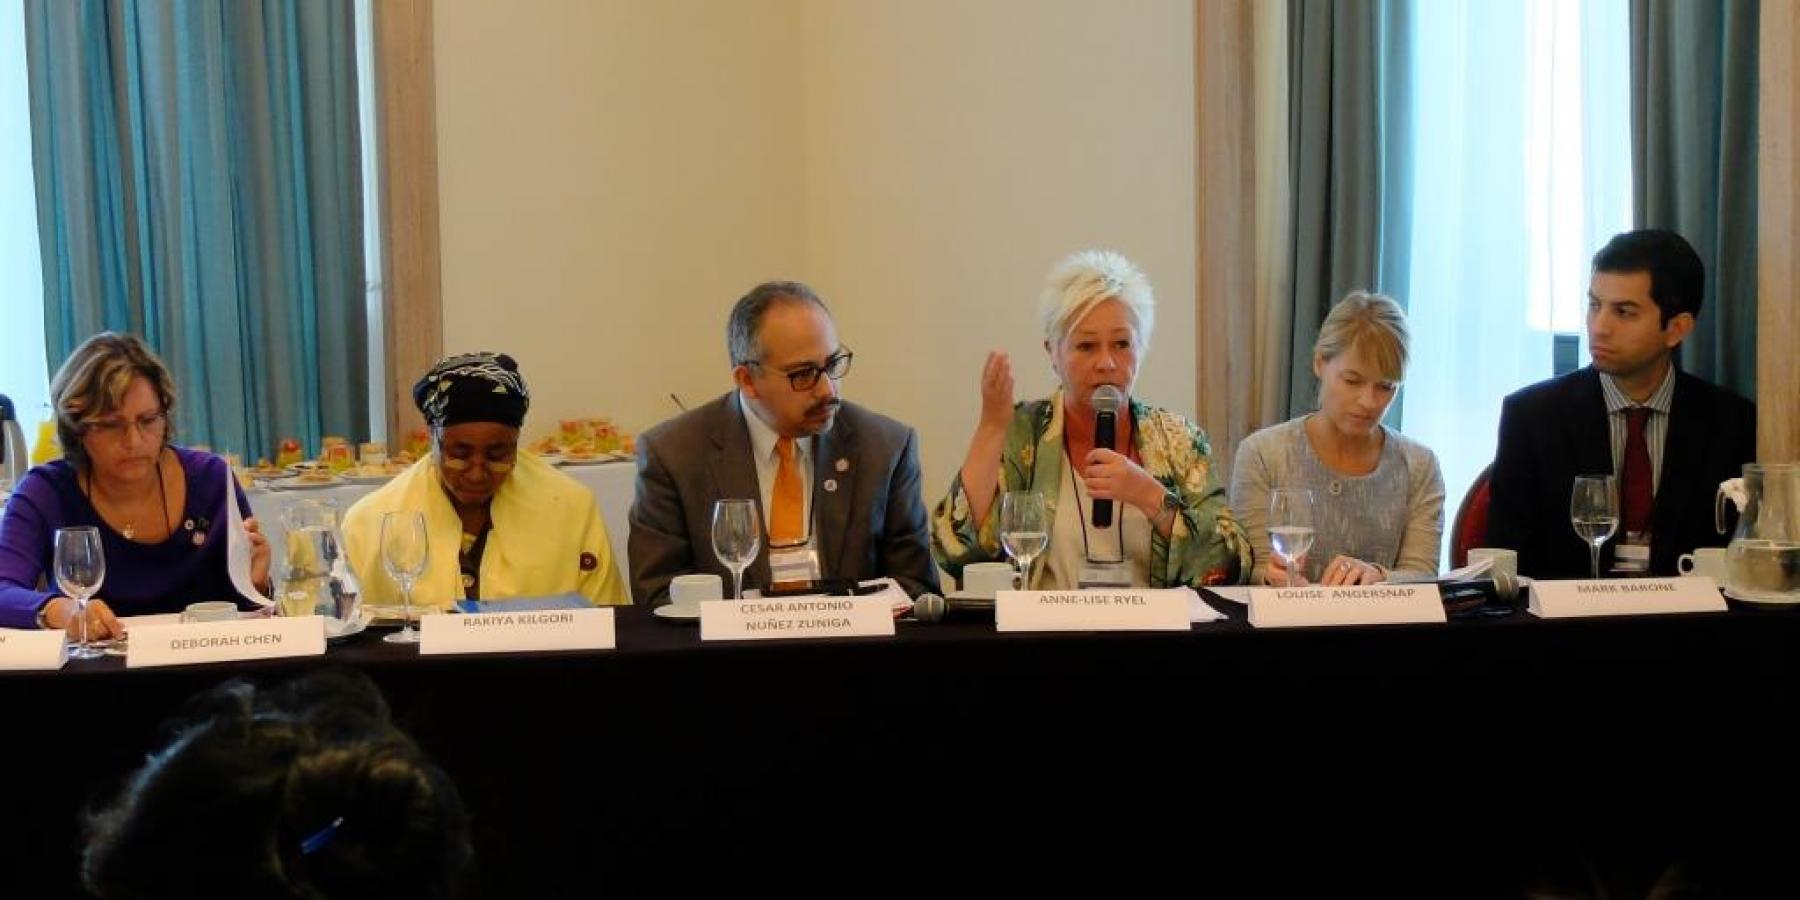 Speakers at the NCD Alliance Breakthrough Breakfast